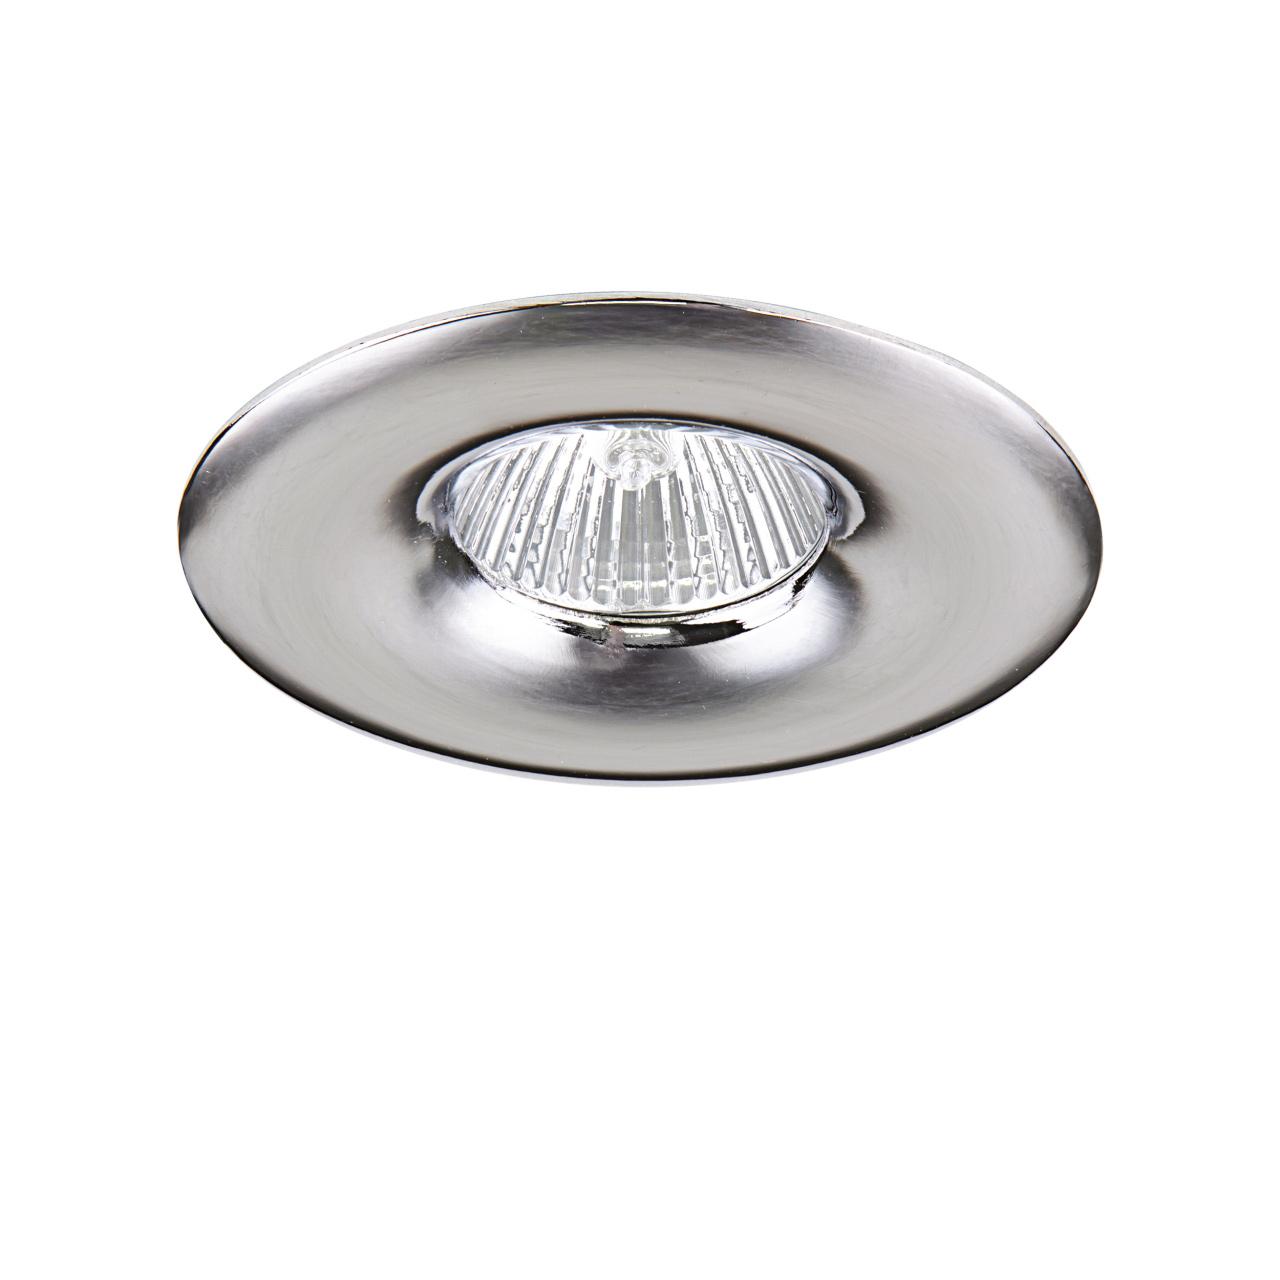 Светильник Levigo MR16 / HP16 хром Lightstar 010014